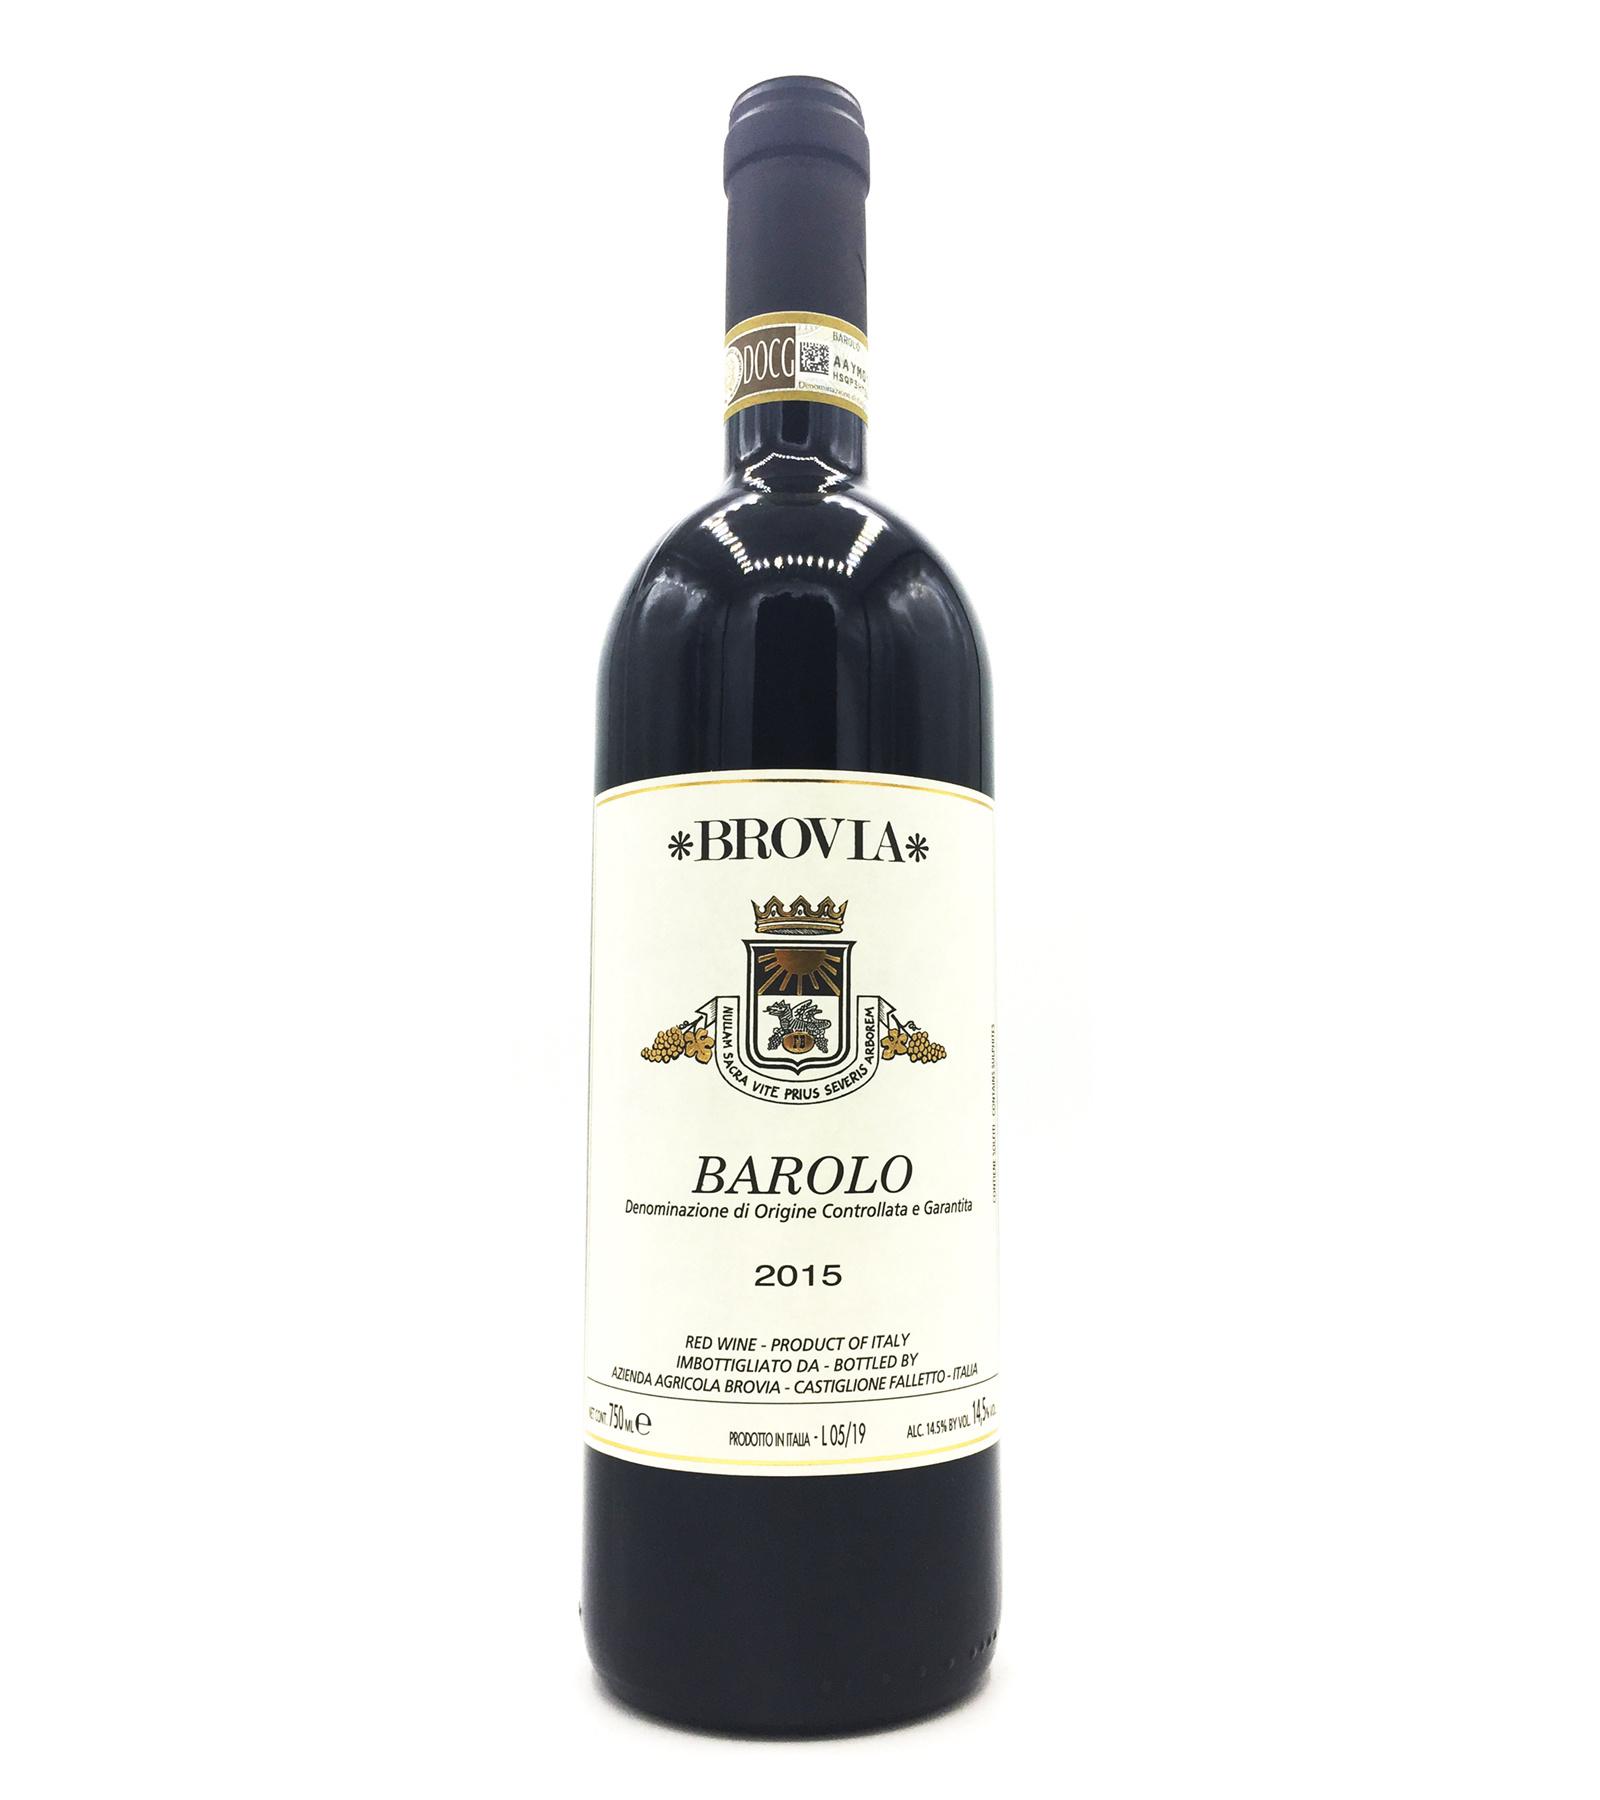 Barolo 2015 Brovia